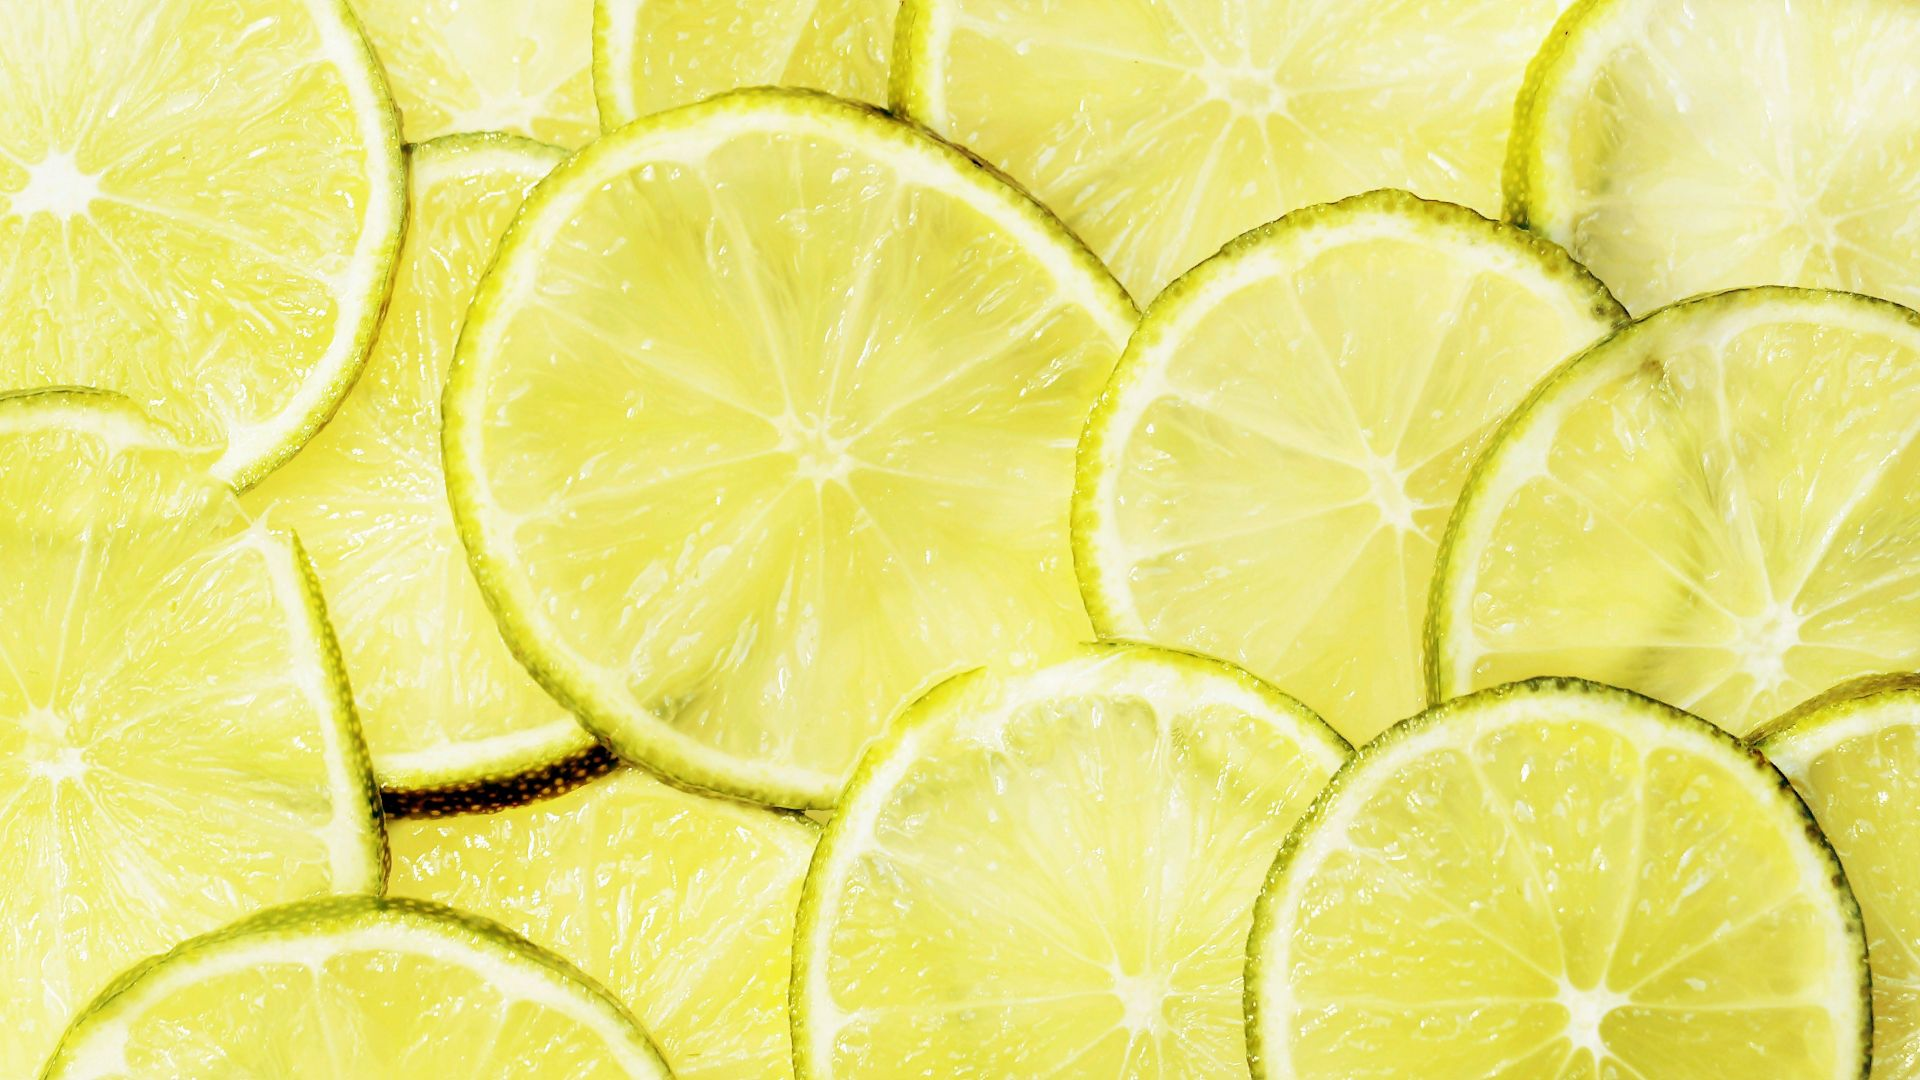 Lemon slices, yellow fruits, lemon